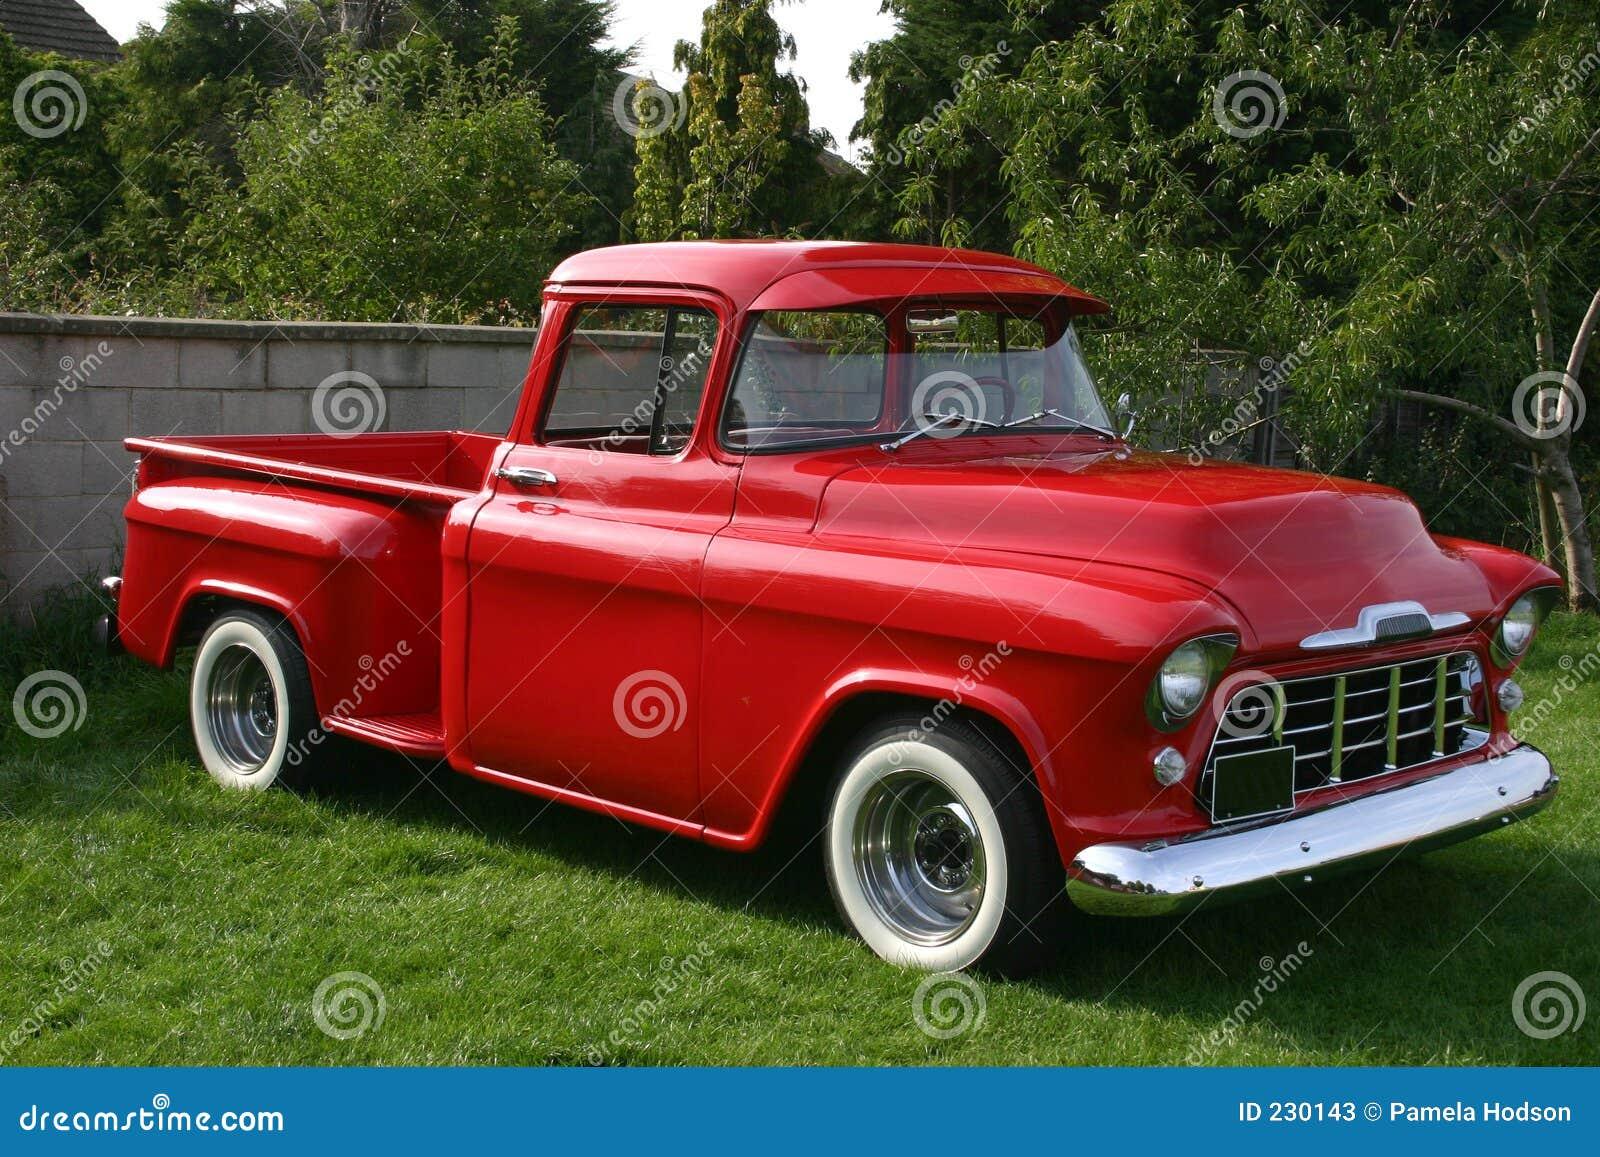 Truck chevrolet